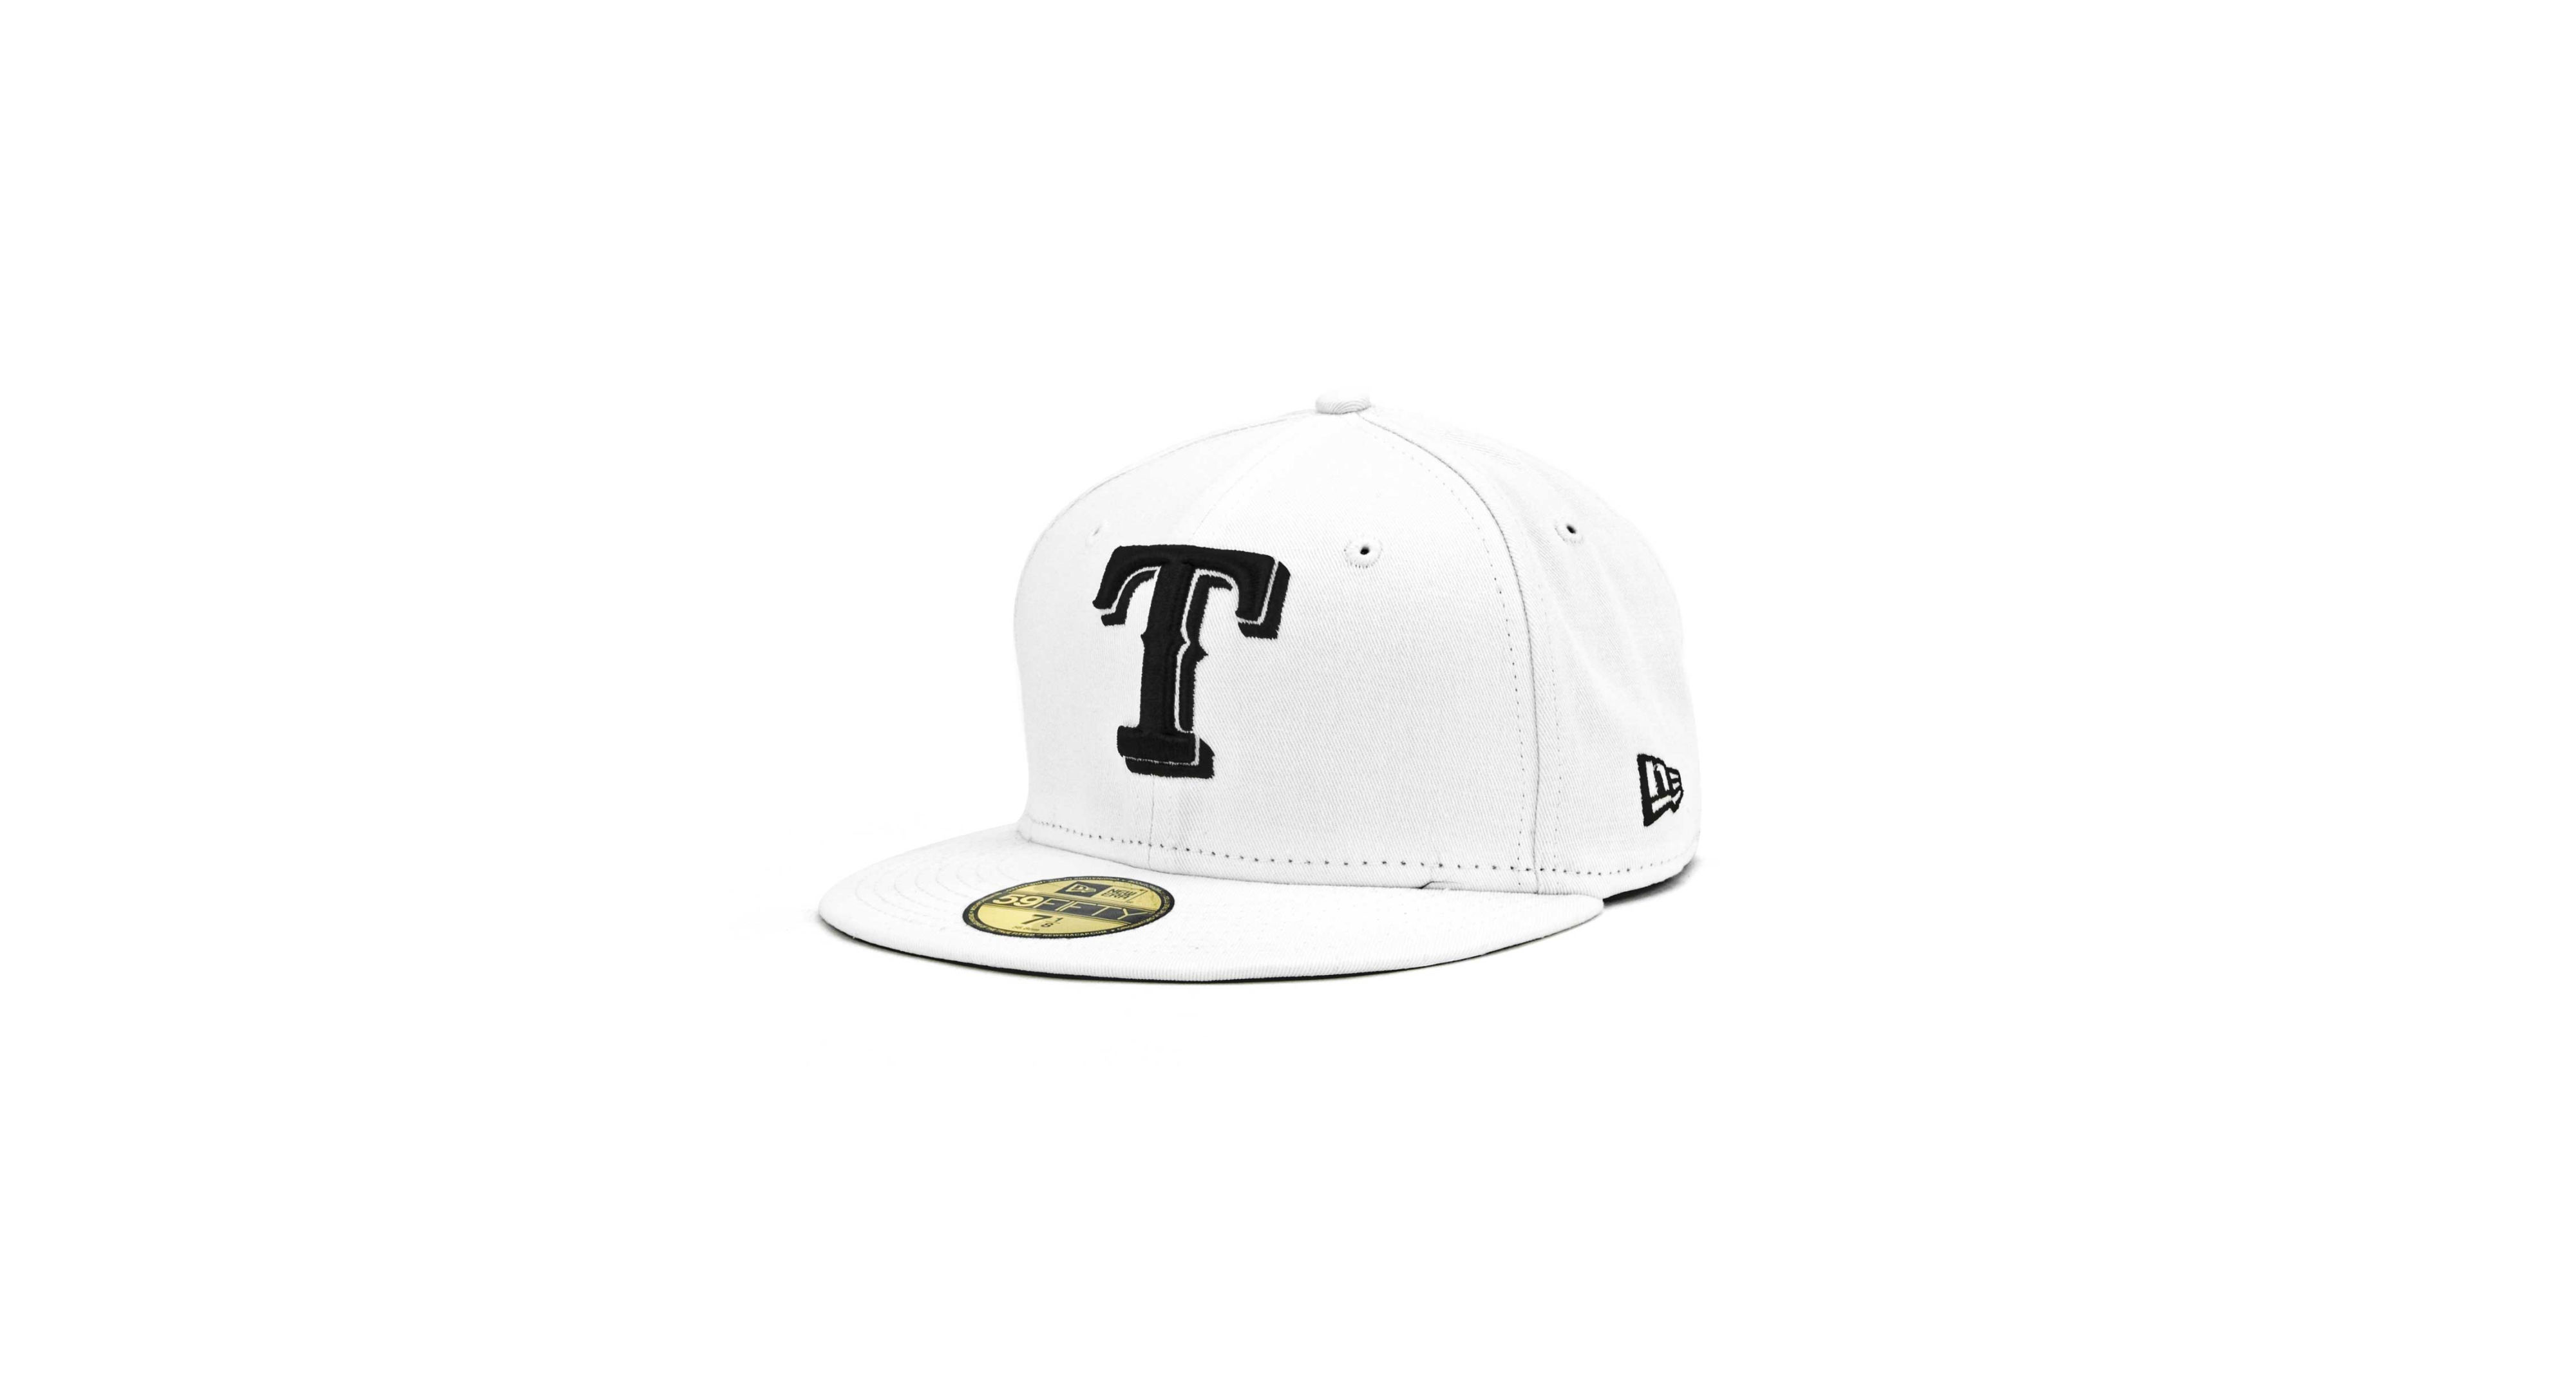 huge discount 08044 d5038 New Era Texas Rangers Mlb White And Black 59FIFTY Cap